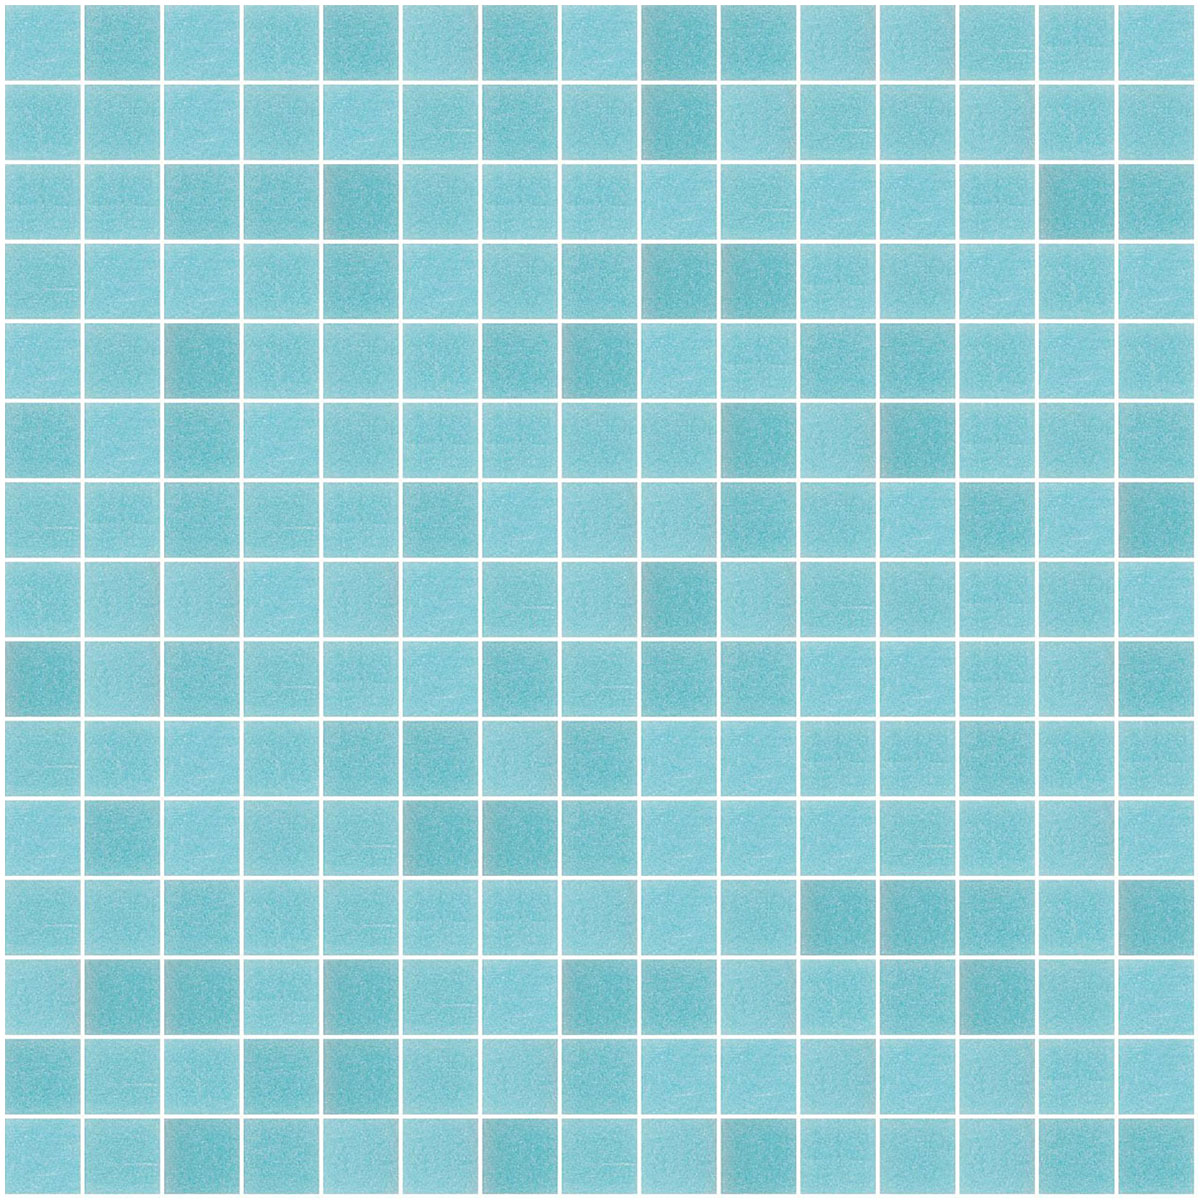 Vitreo - 121 Light Blue - mosaic feature pool tiles - Stone3 Brisbane